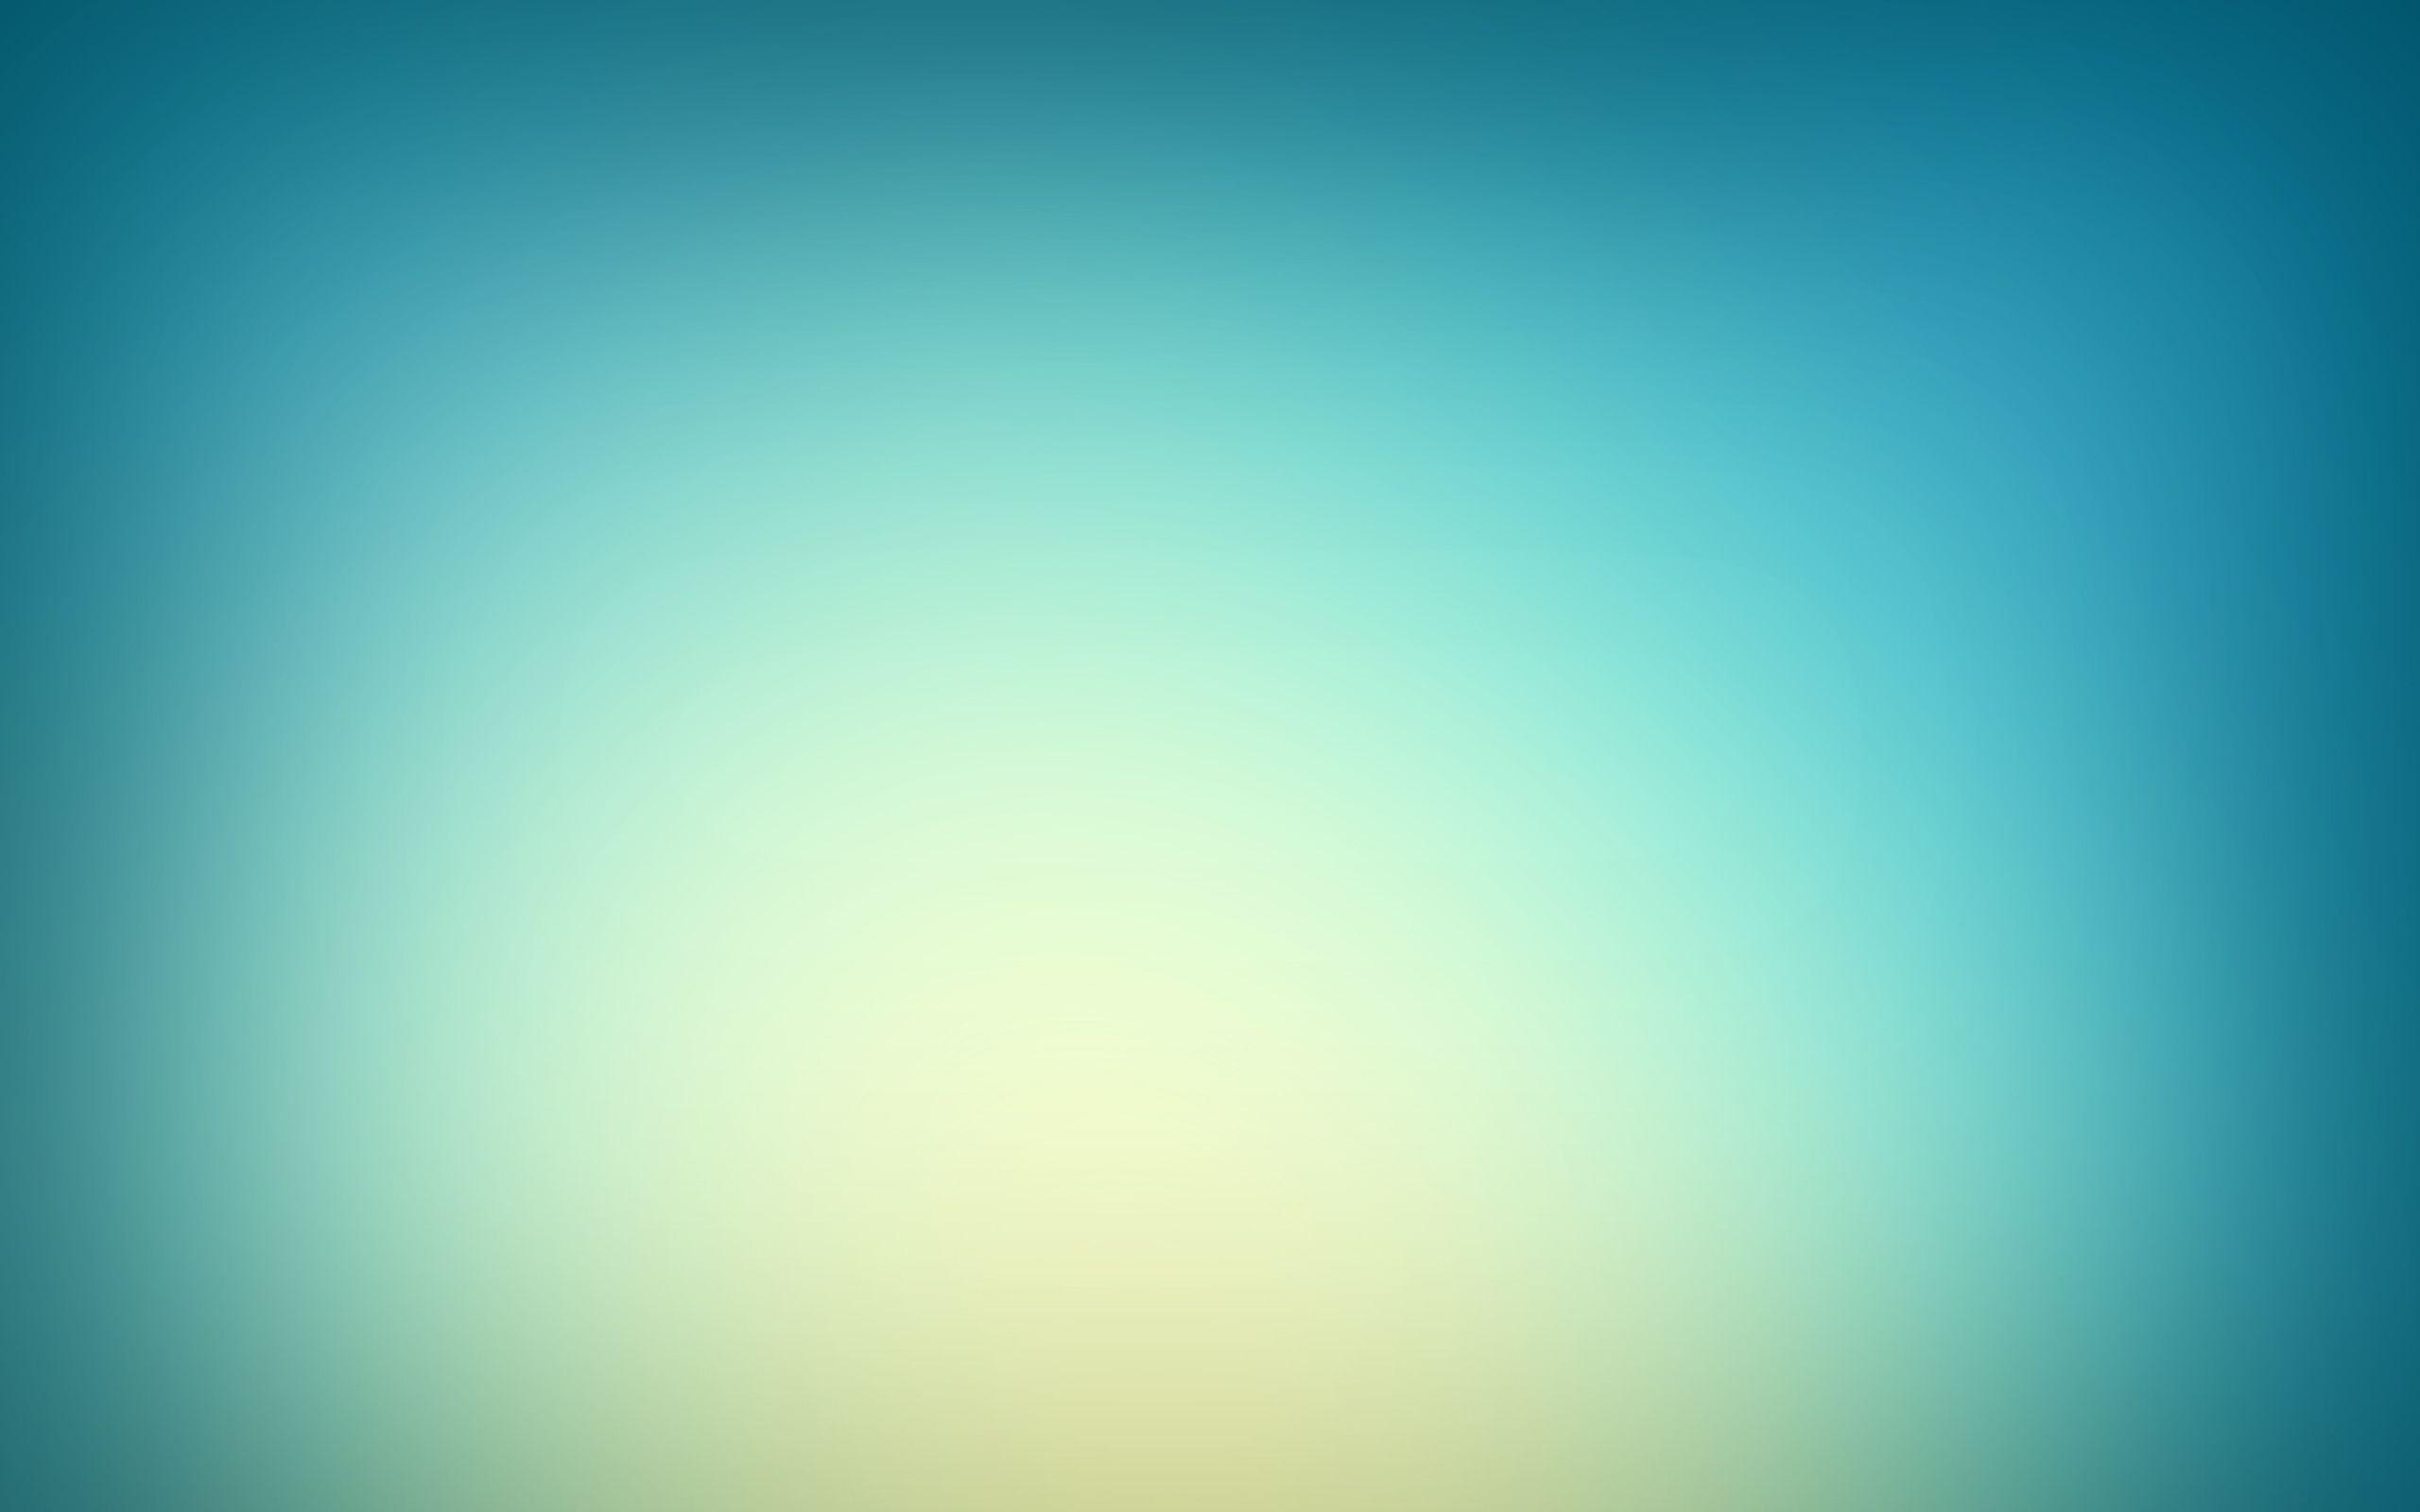 Images of Gradient | 2560x1600